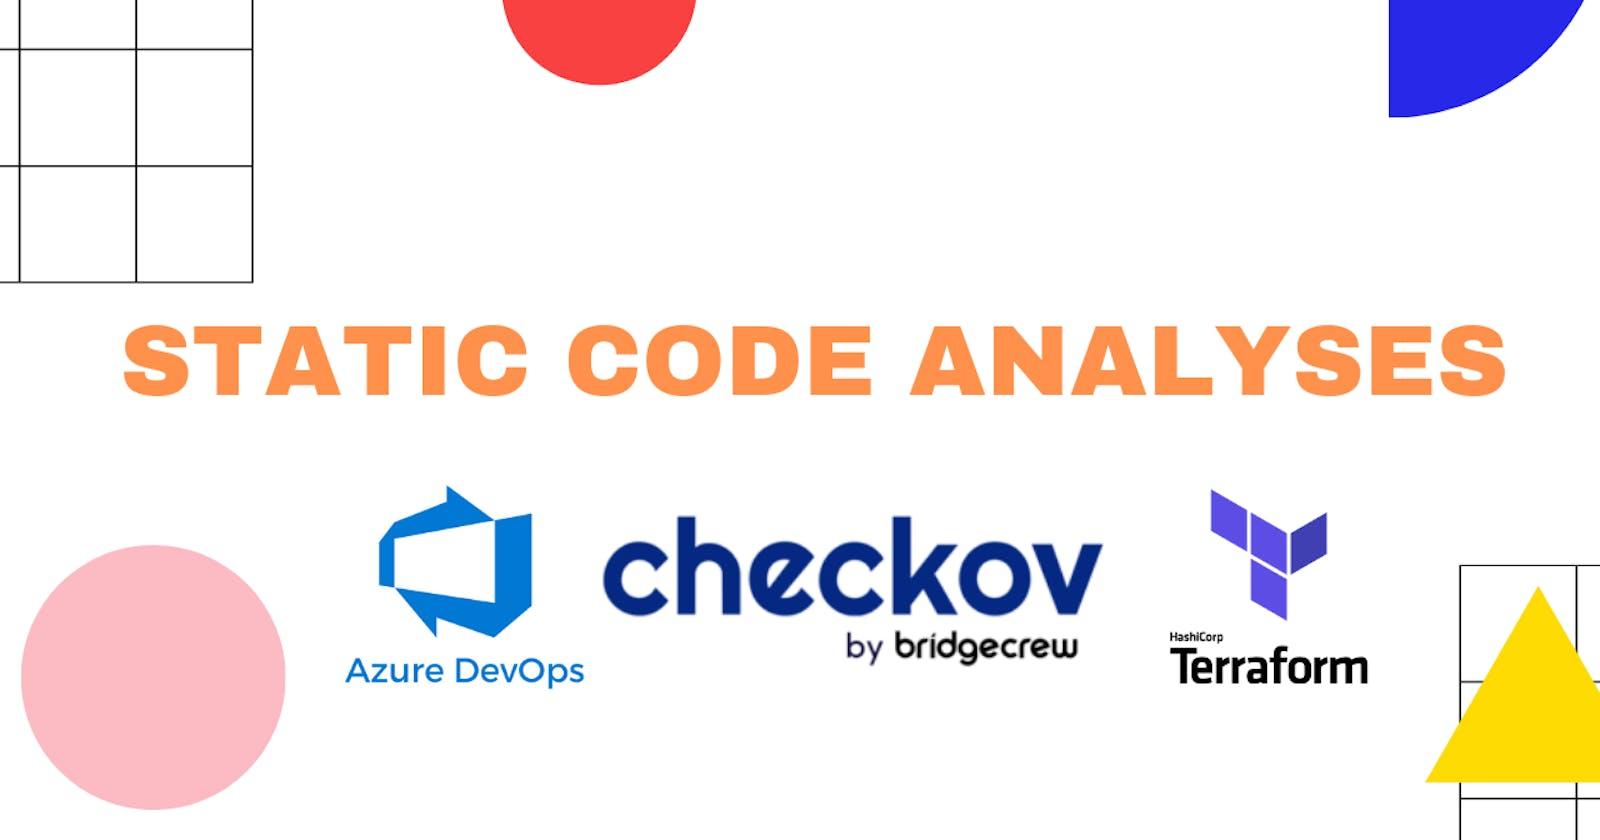 Static Code Analyses - Checkov, Terraform and Azure DevOps